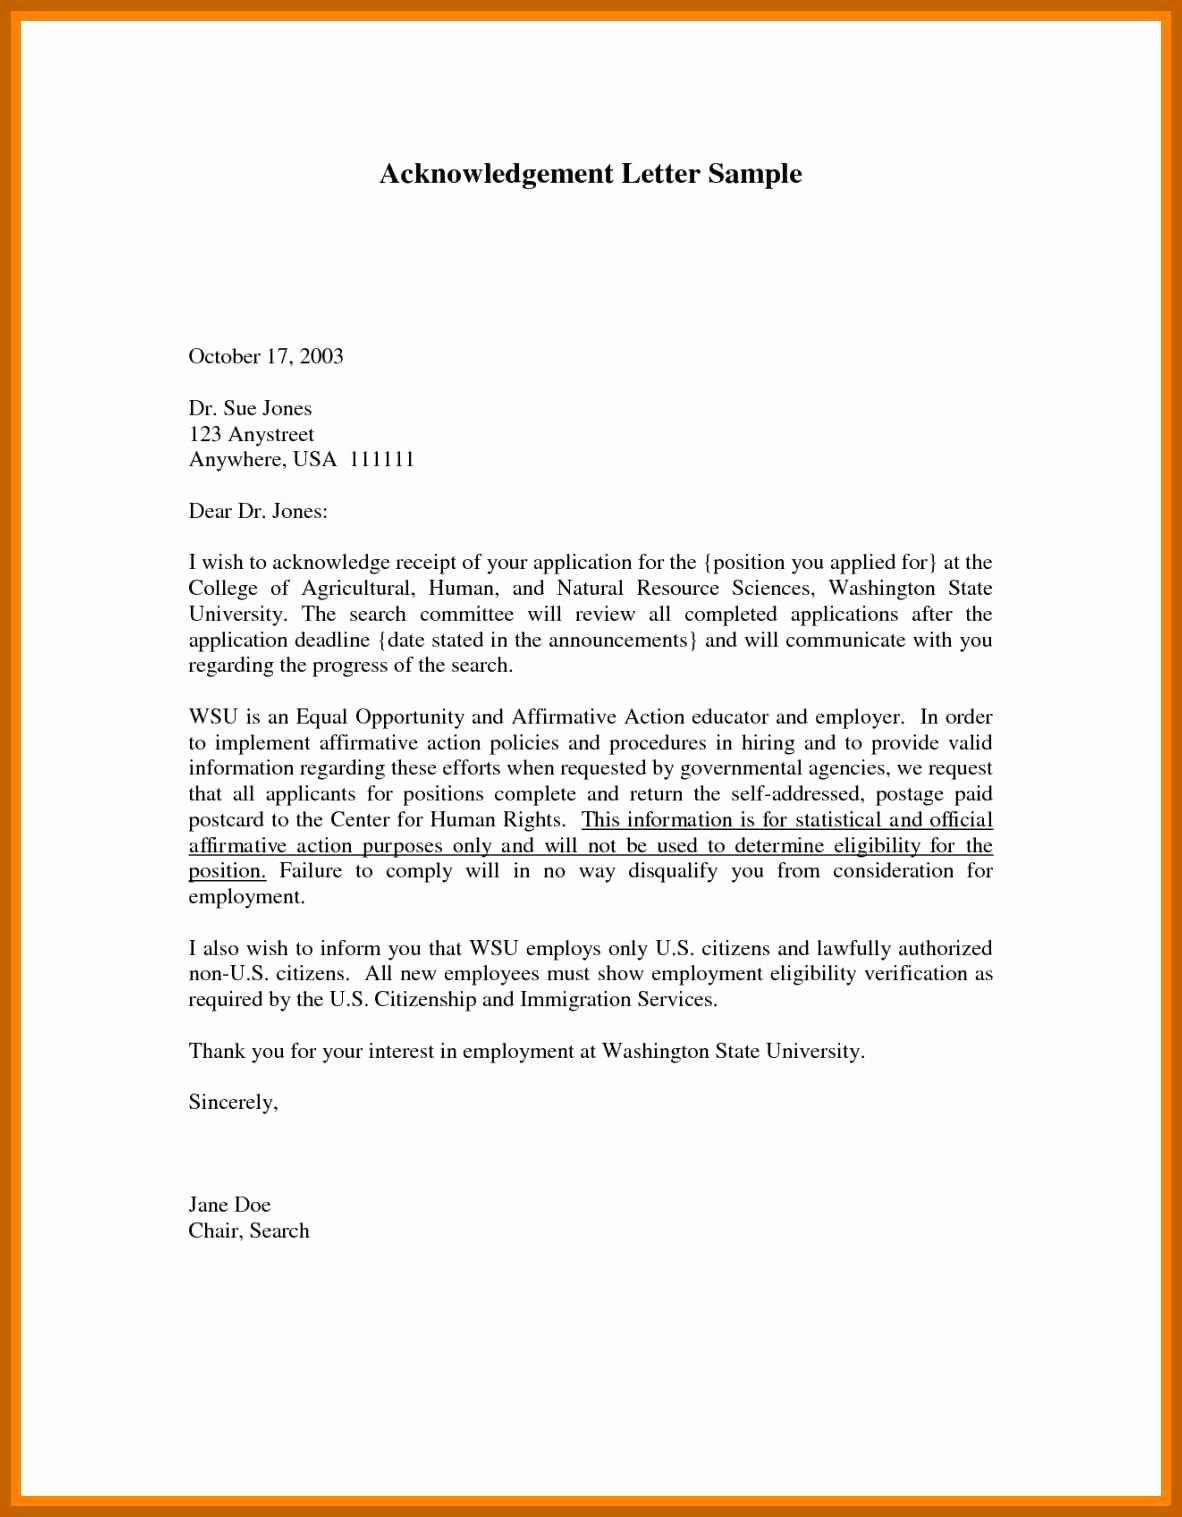 Immigration Support Letter Sample Lovely 5 6 Support Letter Sample for Immigration